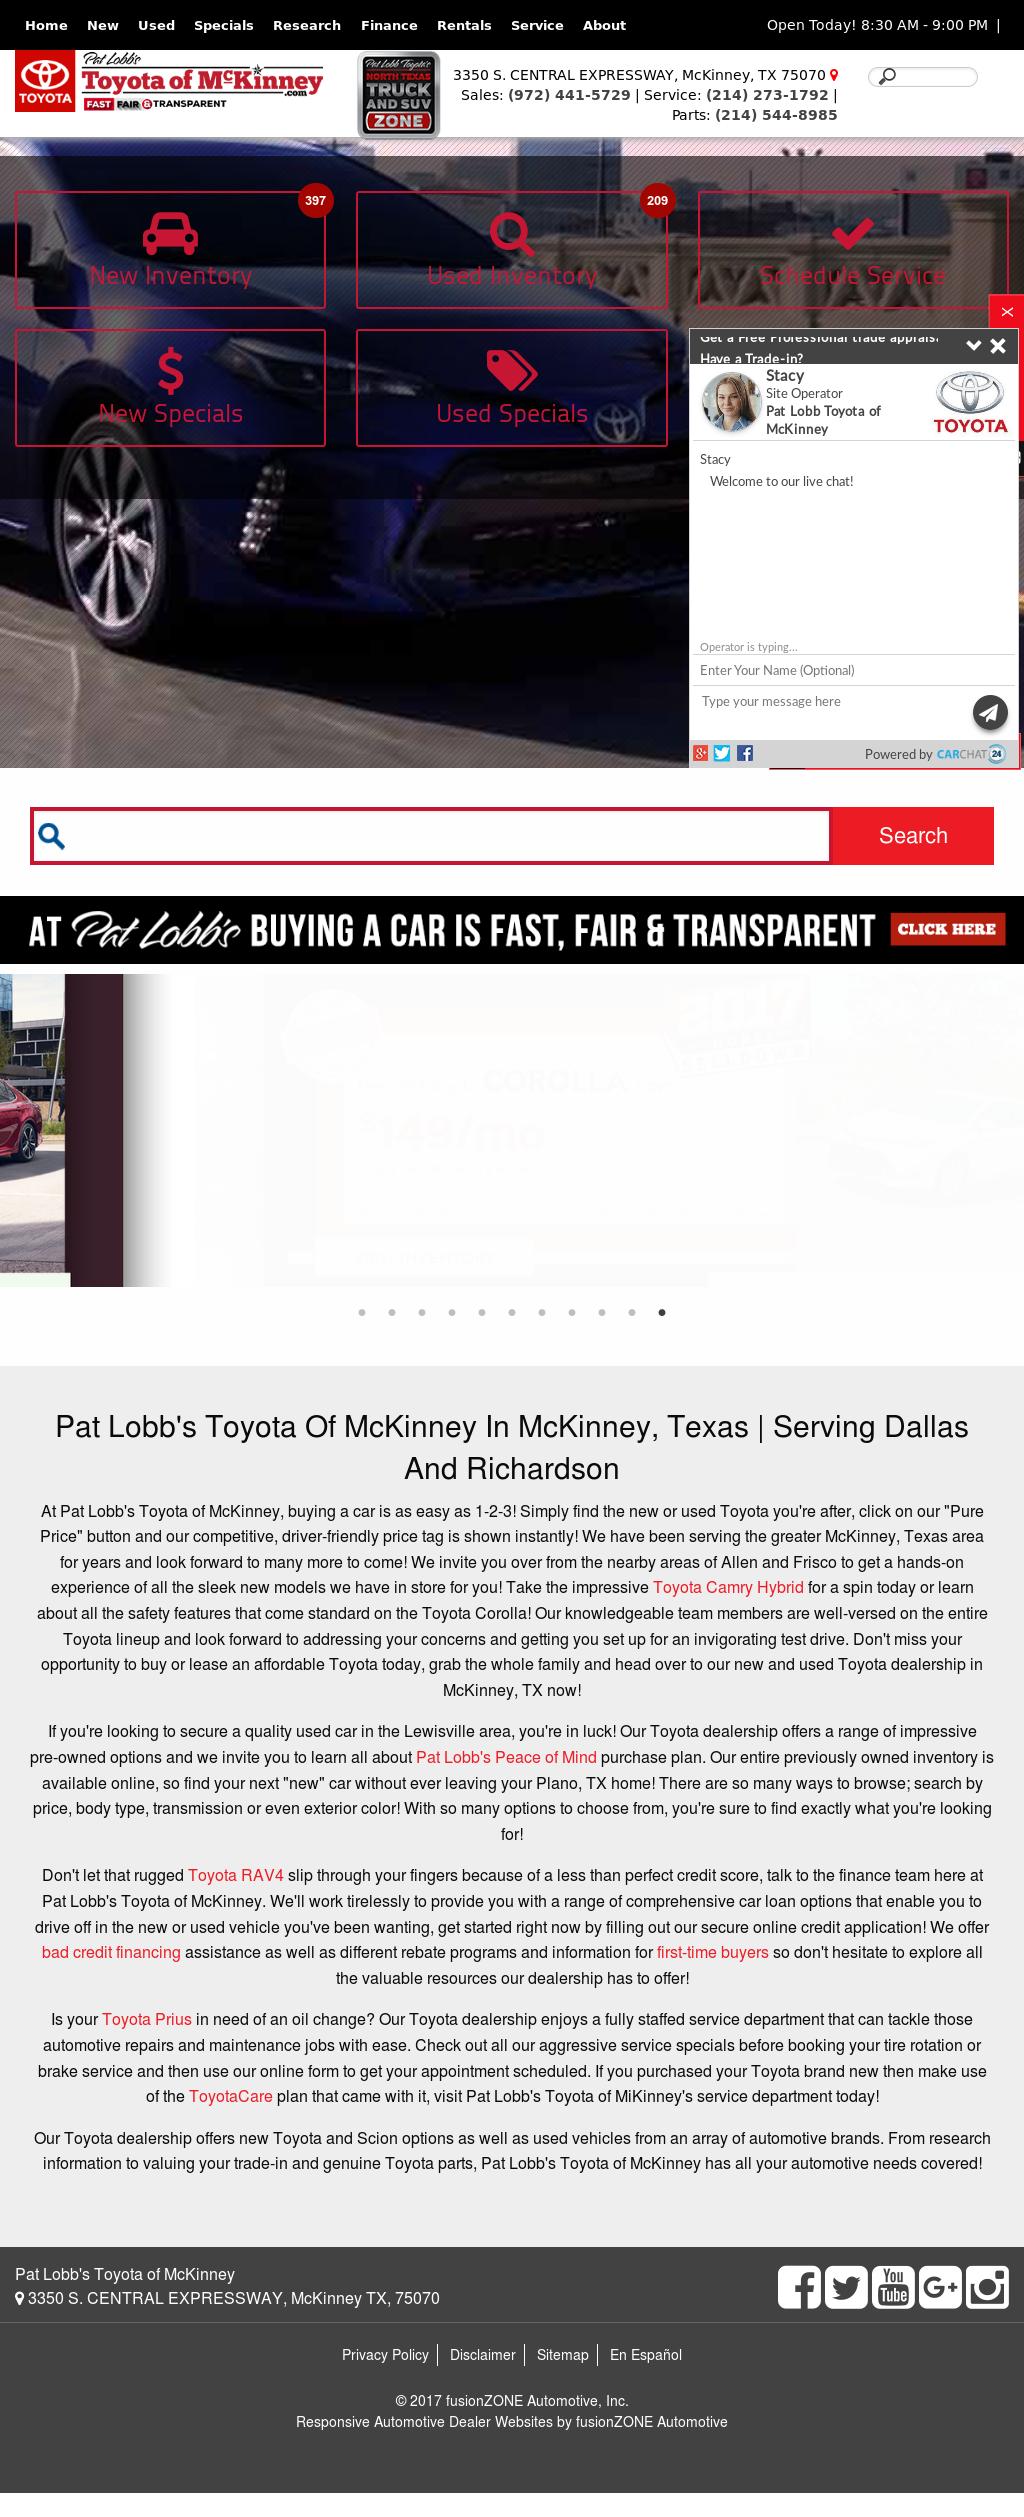 Pat Lobb Toyota Website History